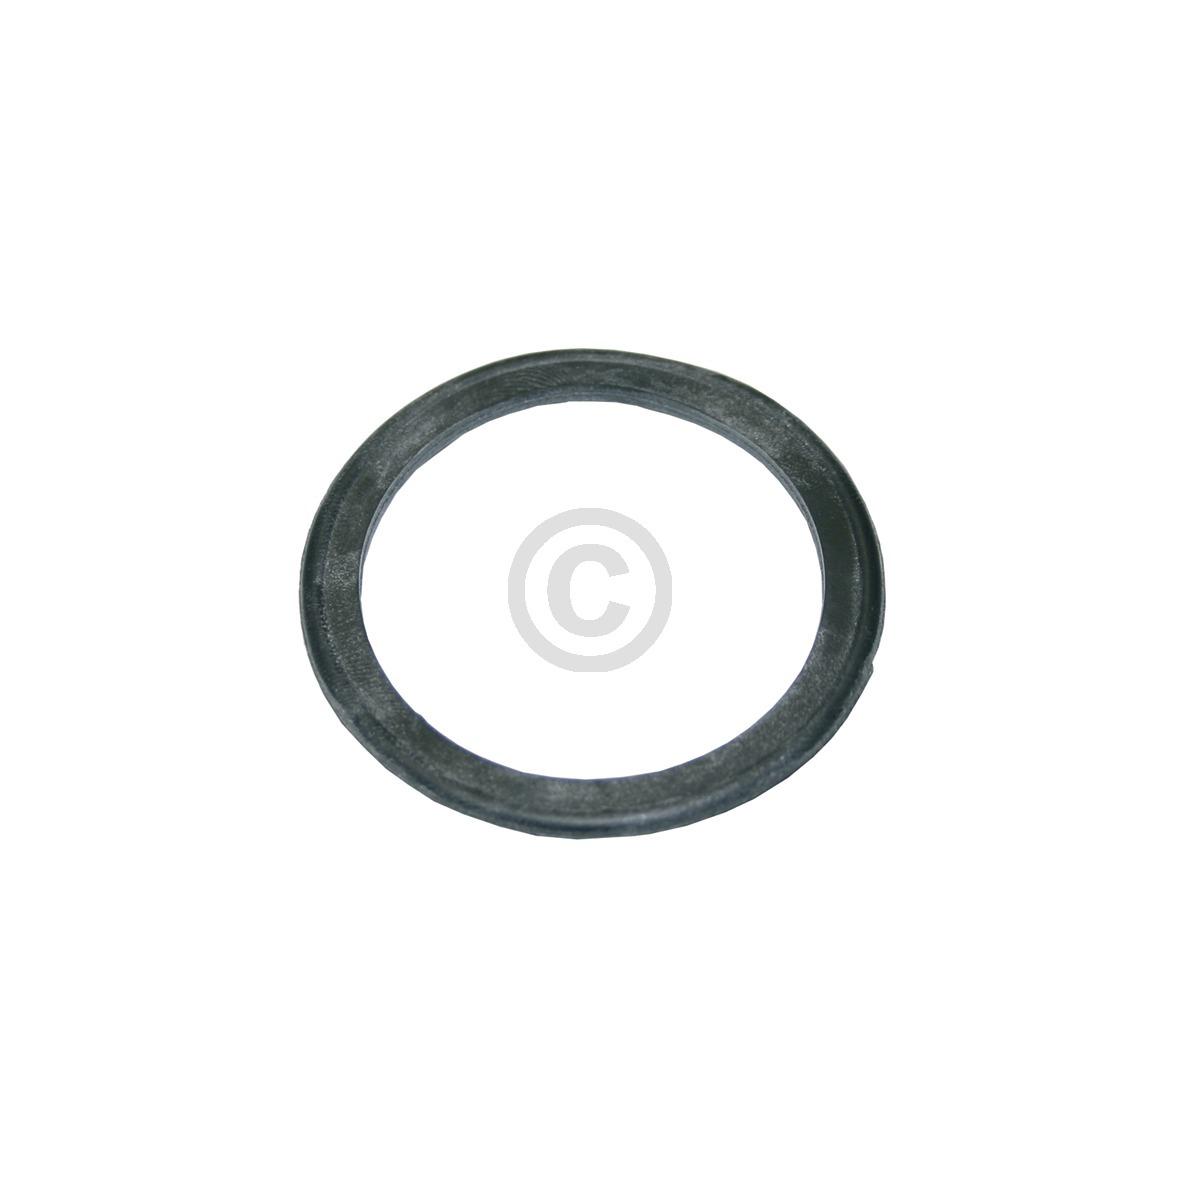 Flusensiebdichtung 55mmØ Waschmaschine AEG 126061601/4